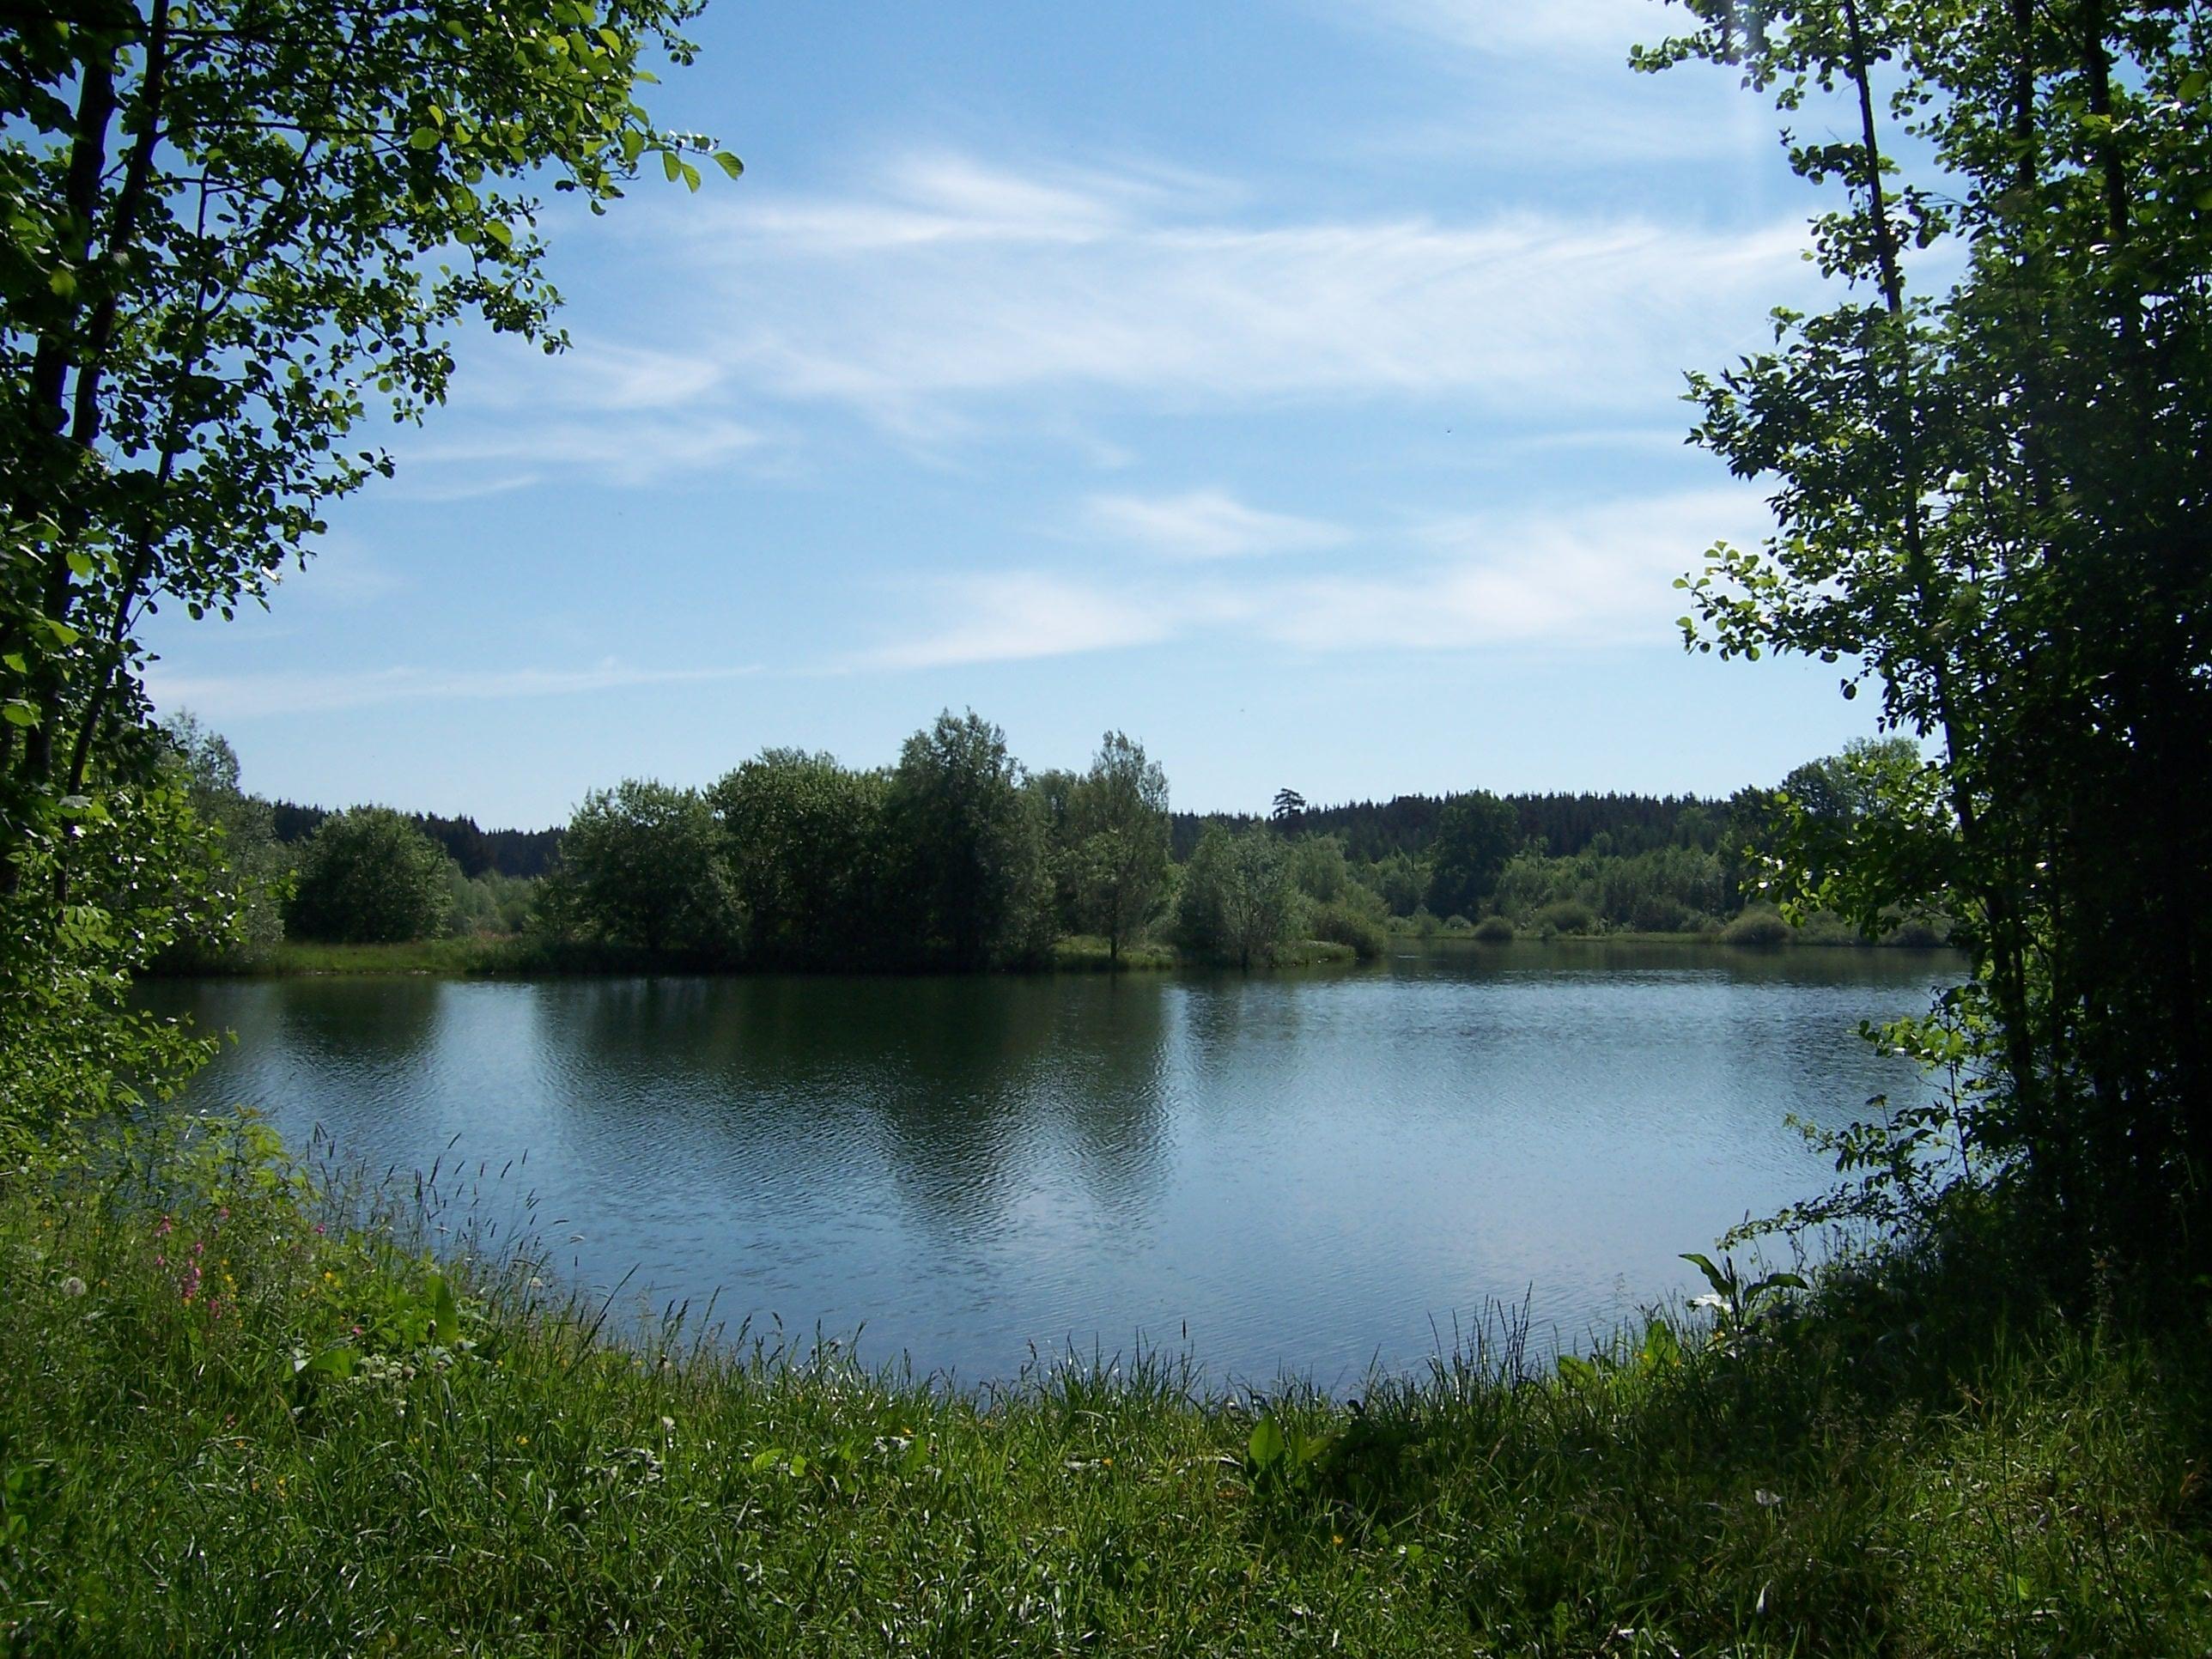 Schwackenreuter Seen1